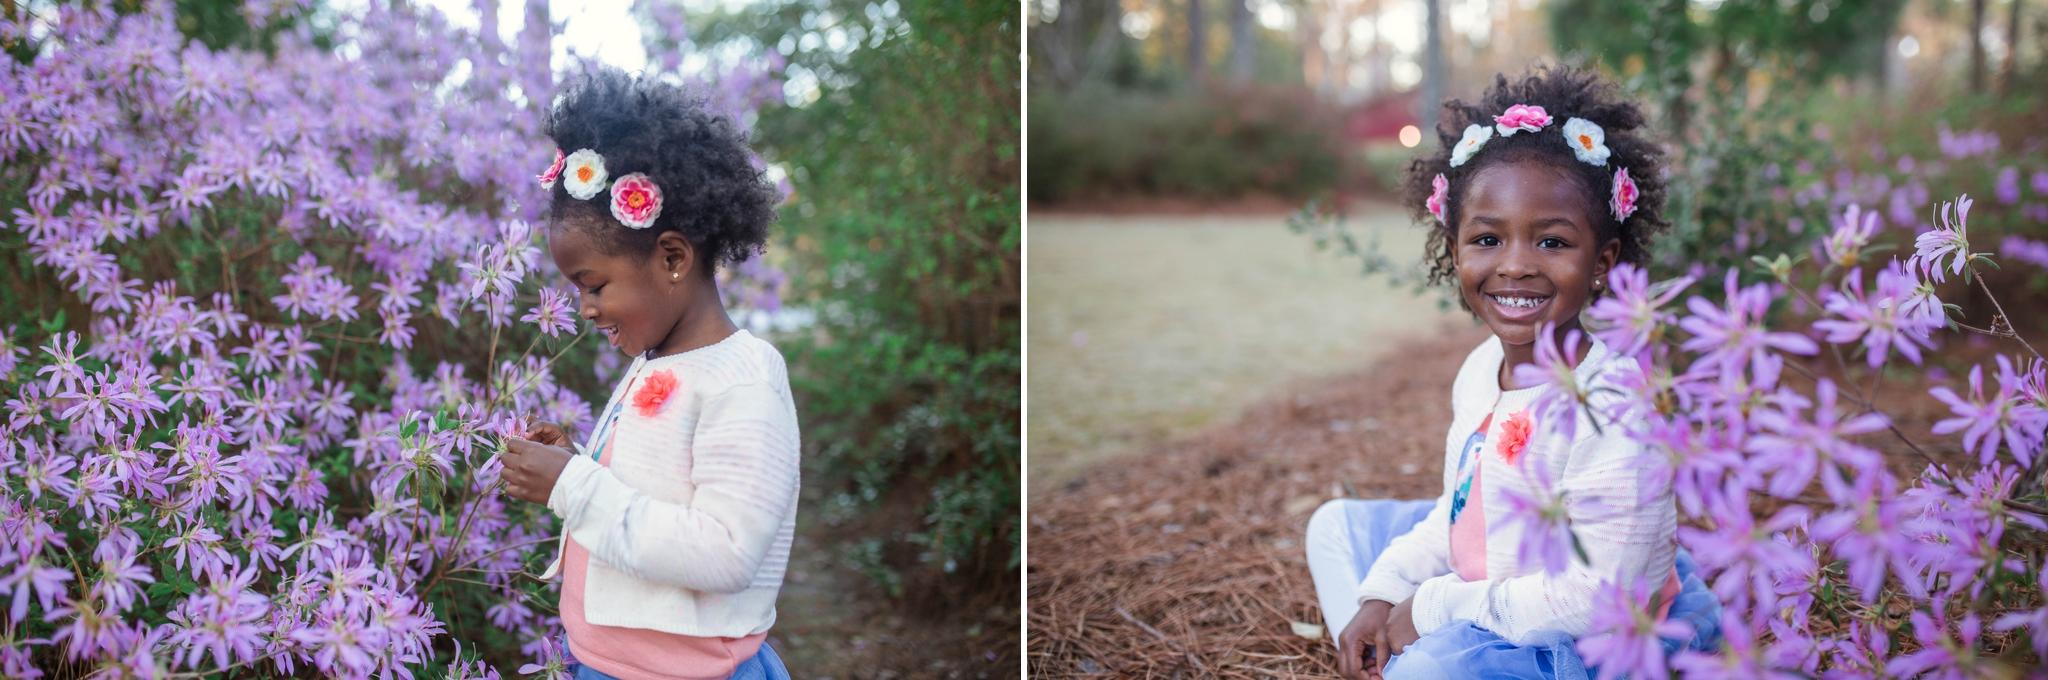 Fayetteville North Carolina Children Family Photographer - Johanna Dye Photography